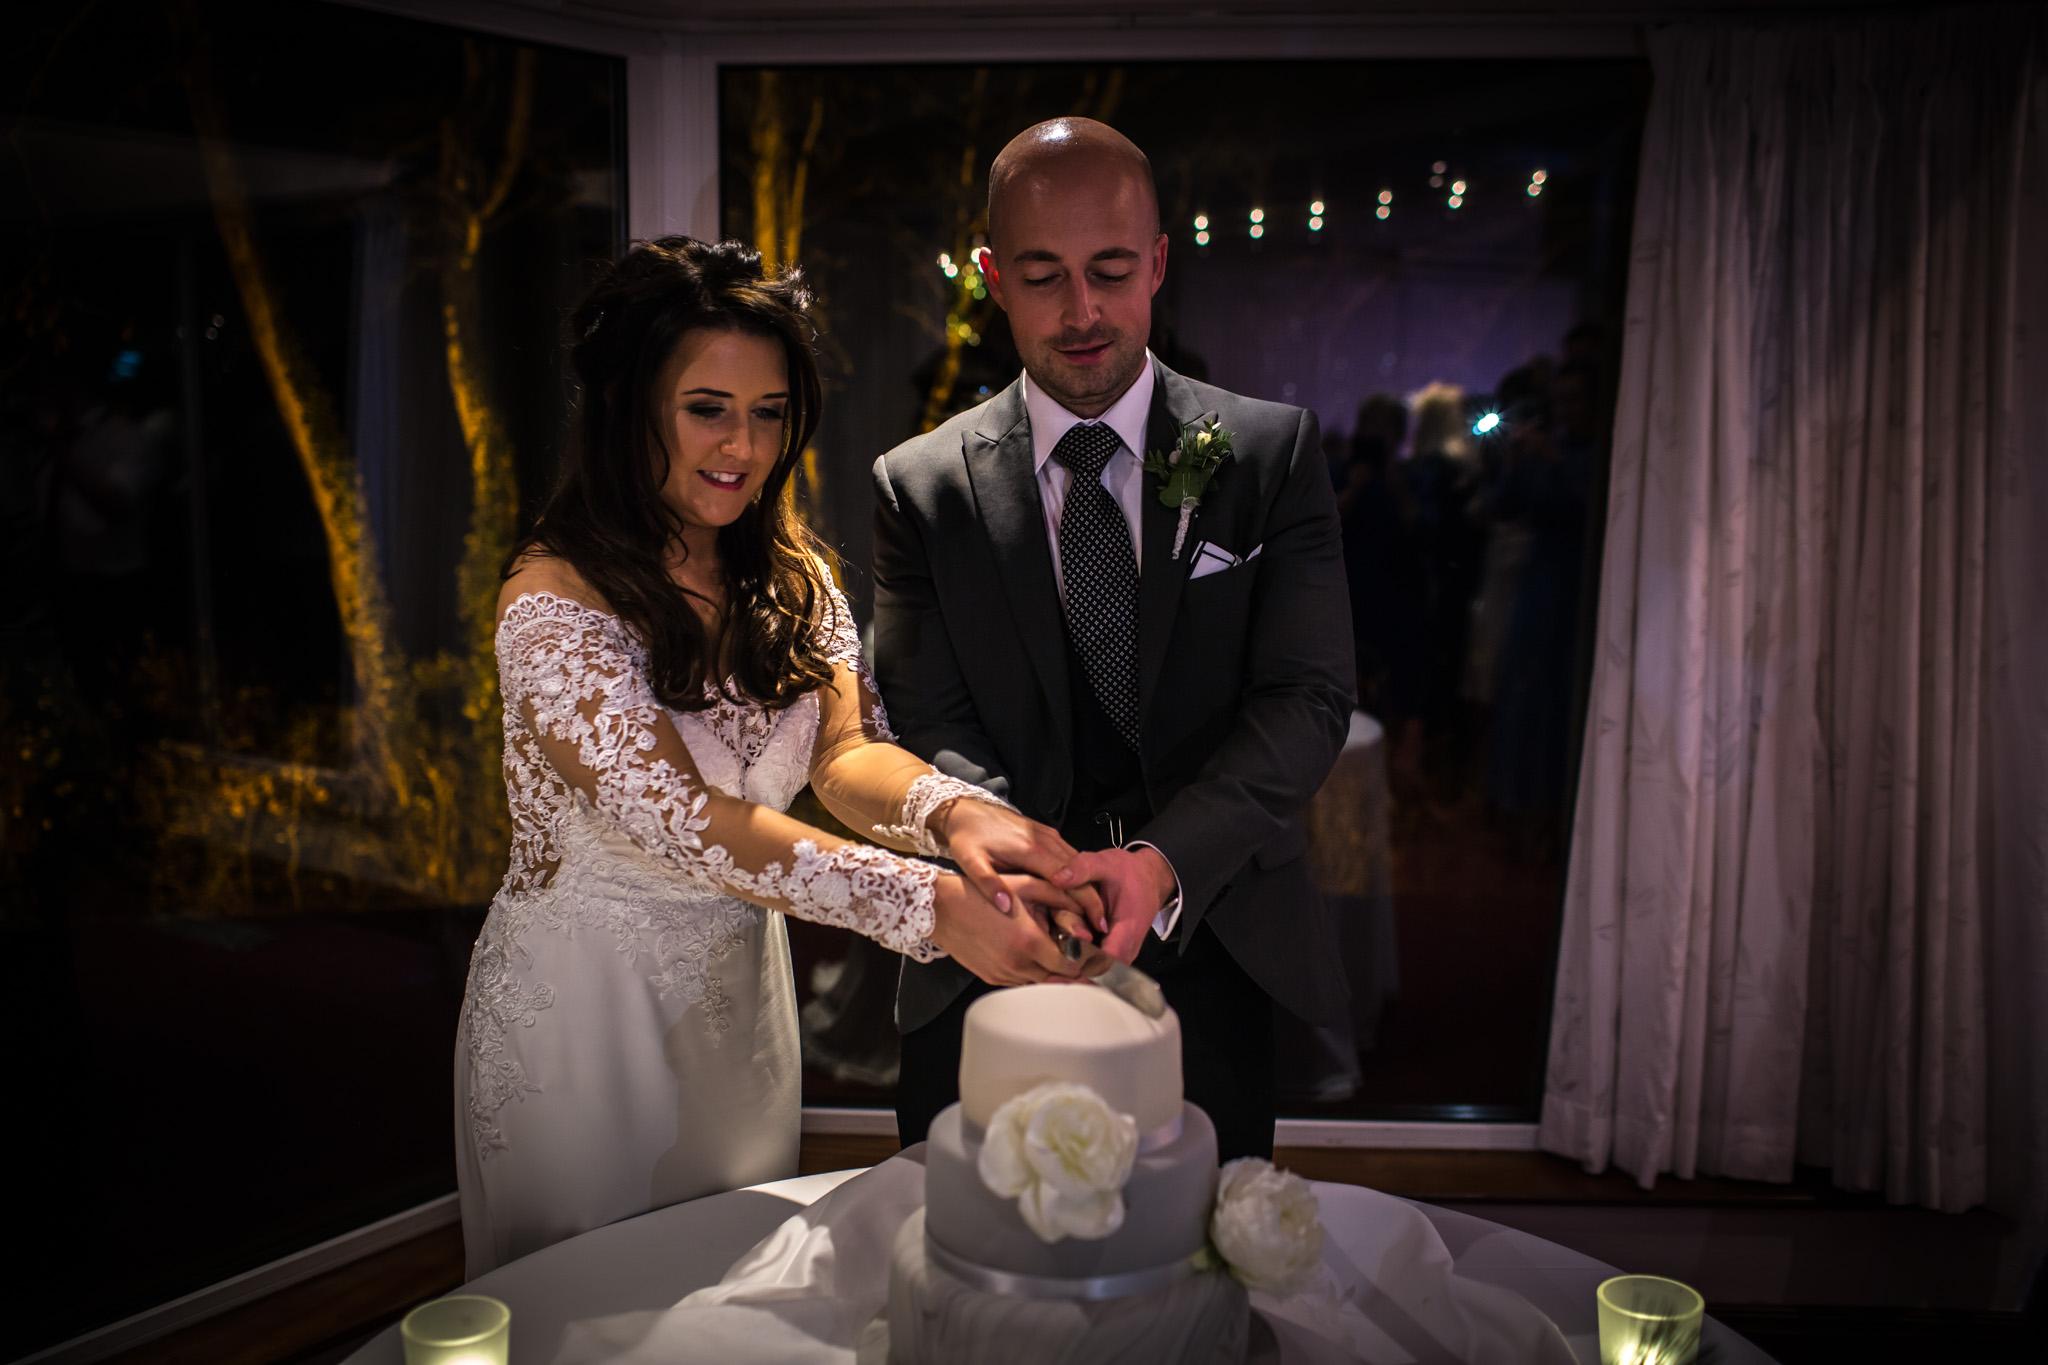 Mark_Barnes_Northern_Ireland_wedding_photographer_Harveys_Point_Donegall_Wedding_photography-Adam&Gemma-59.jpg